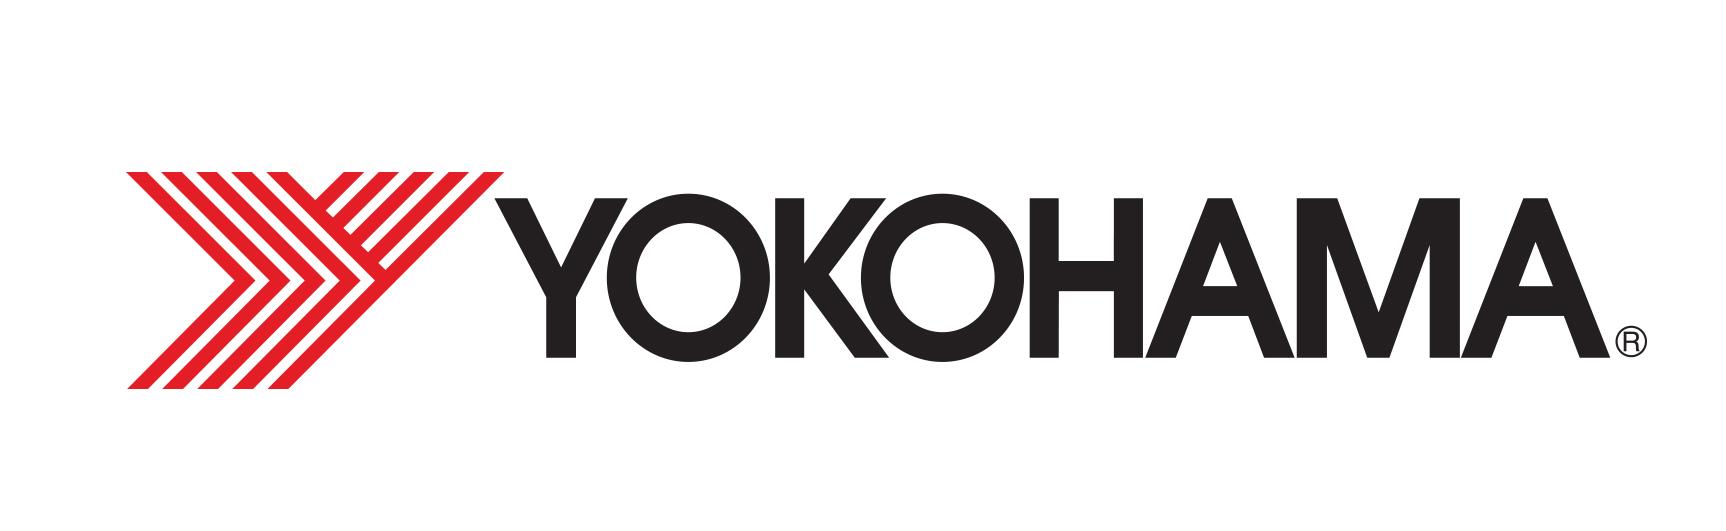 logo Yokohama